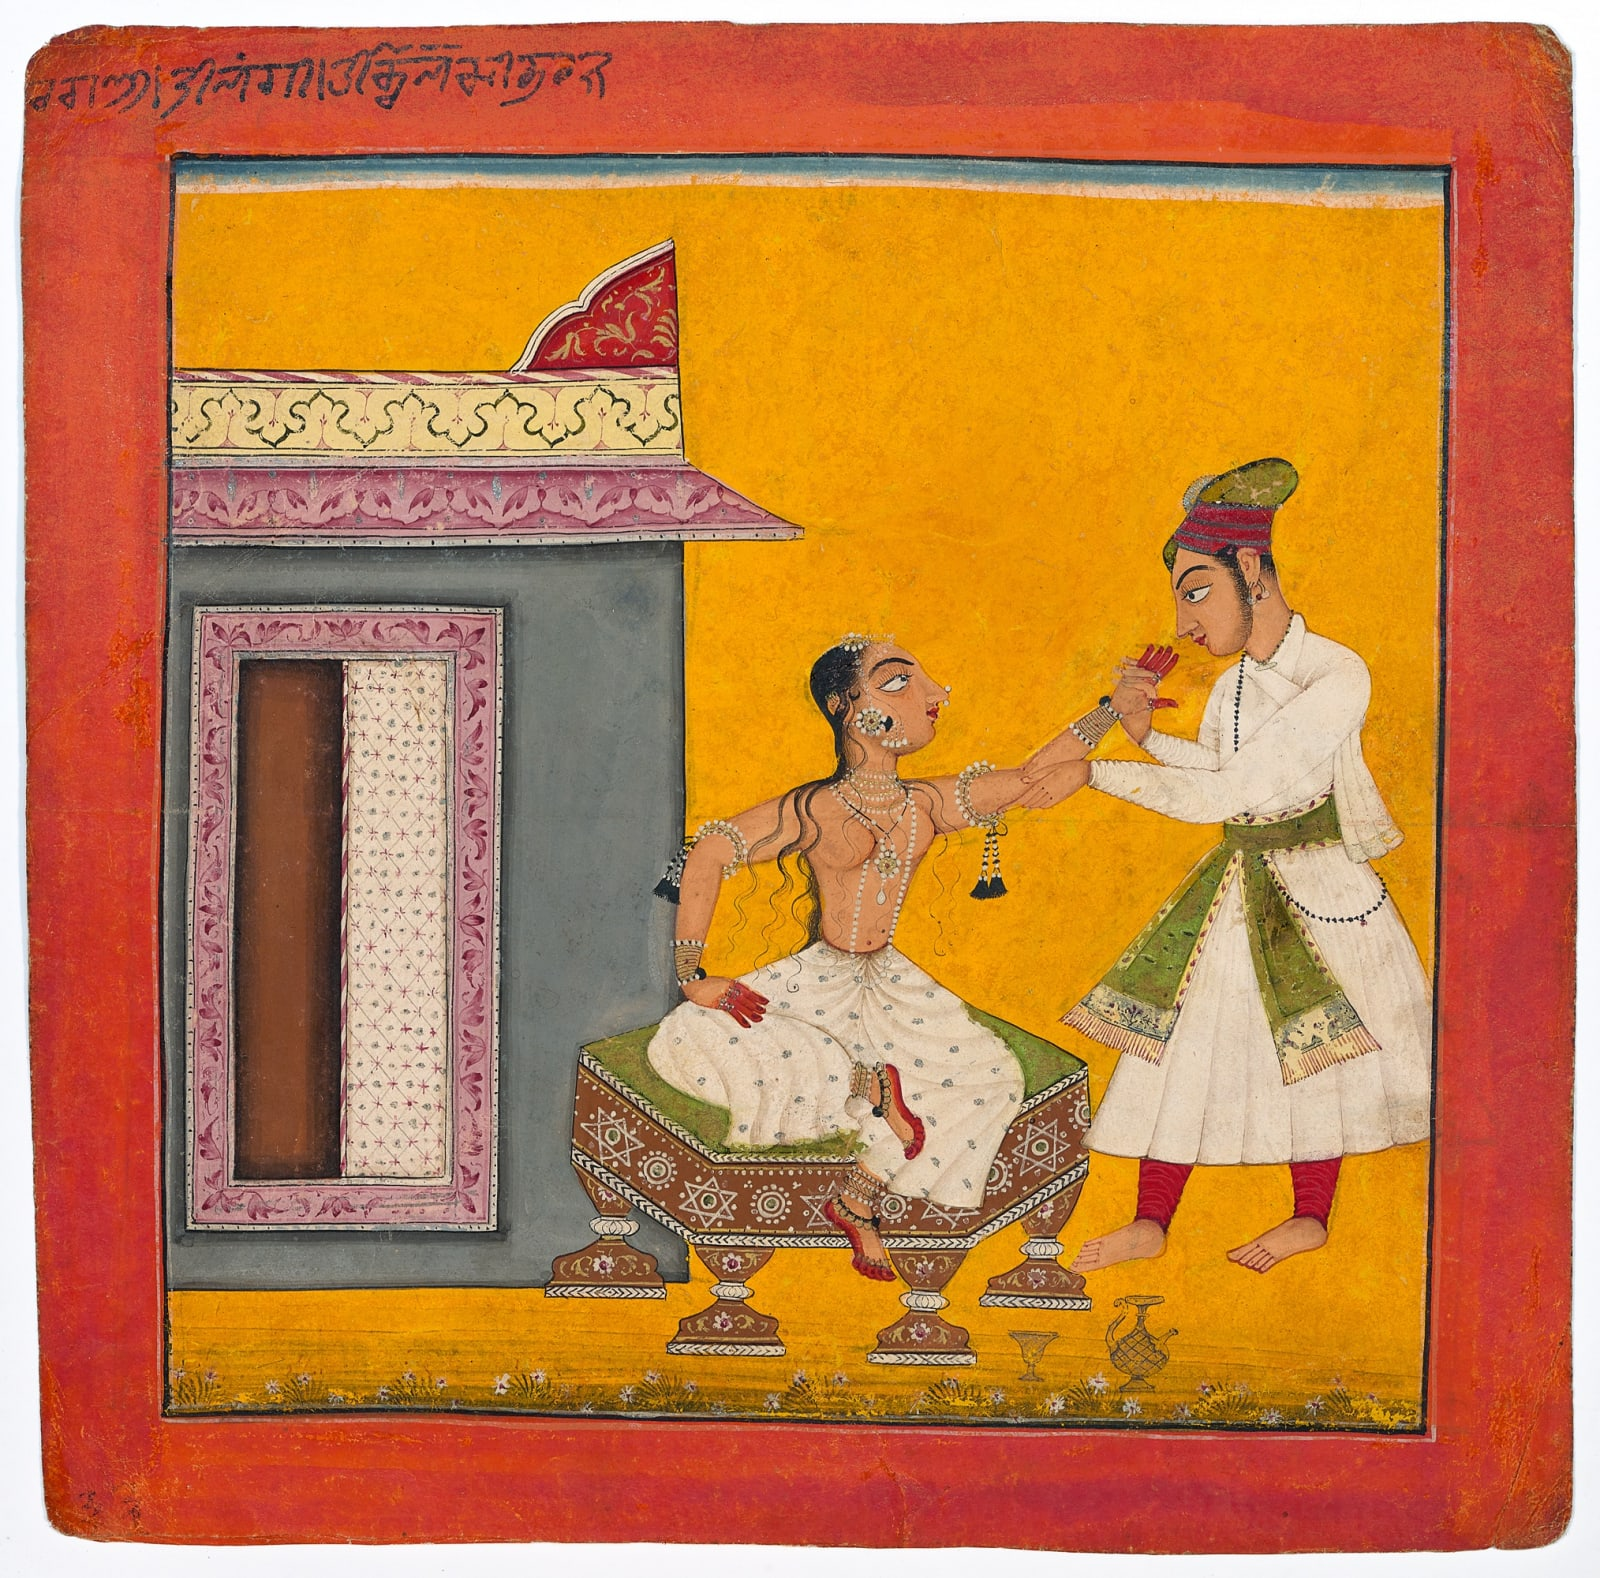 Tilanga Ragini, Page from a Ragamala series, Basohli, c. 1690-1700